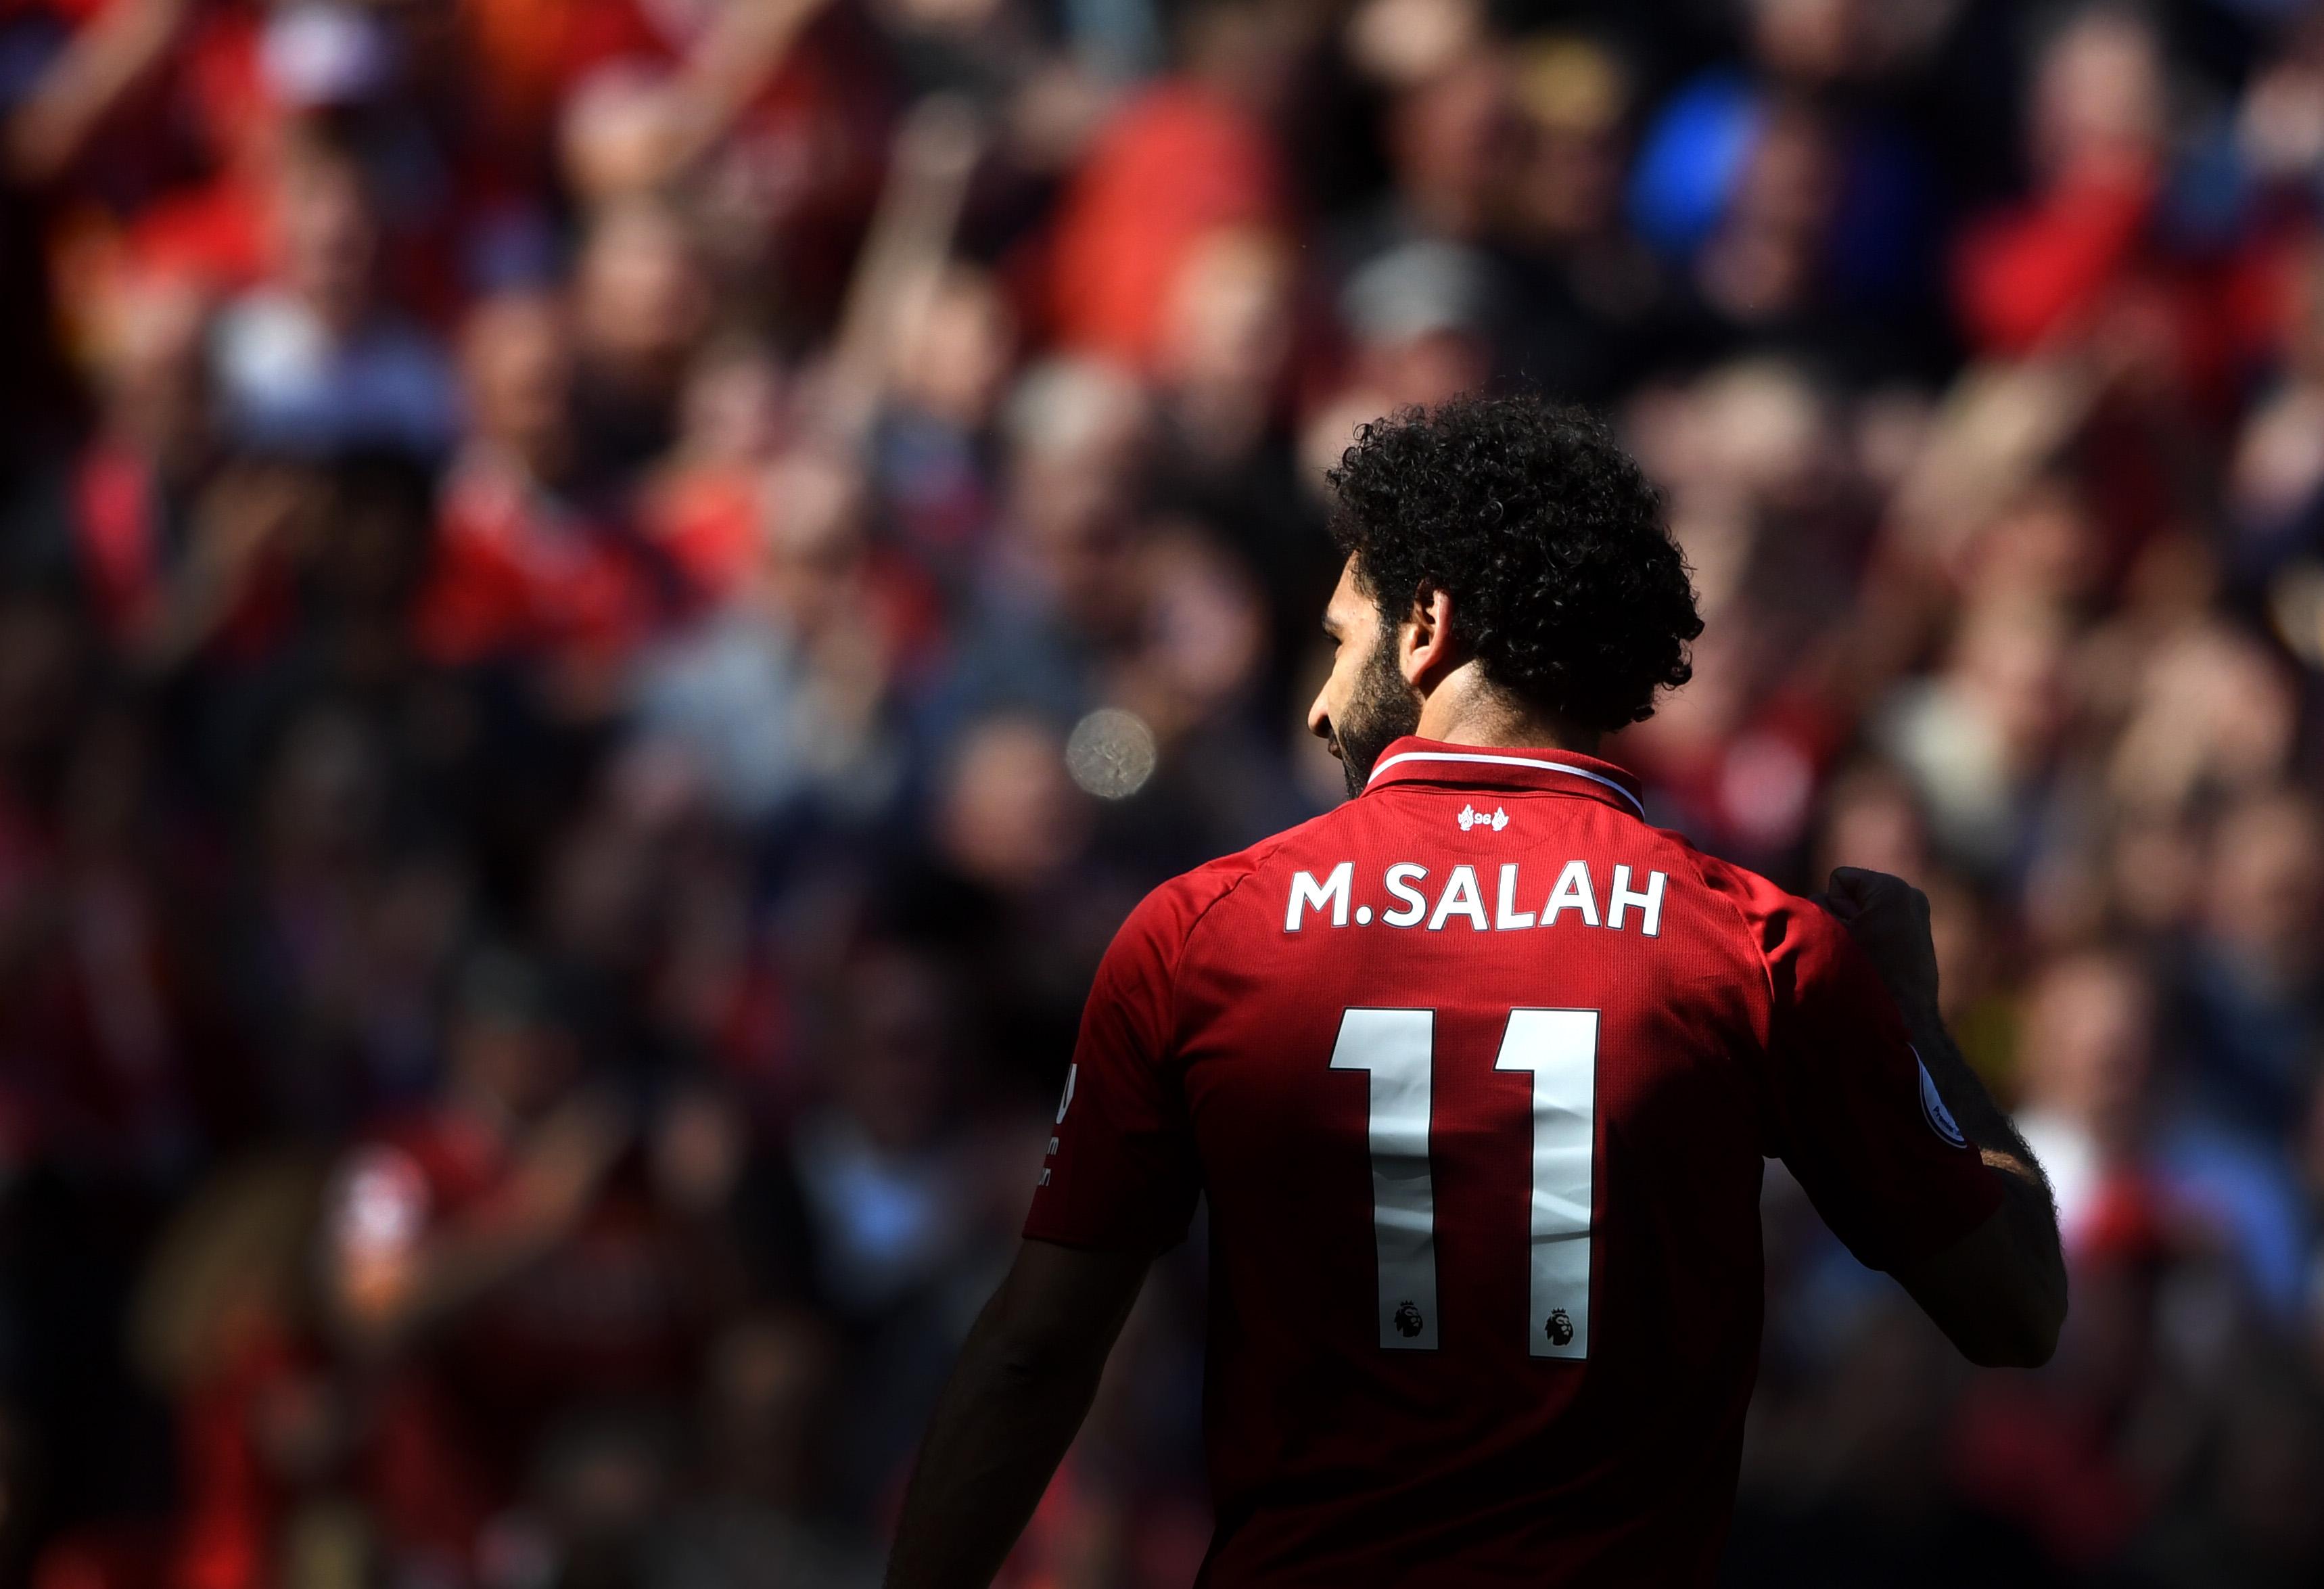 Mohamed Salah Final Champions League Tragedia Port Said